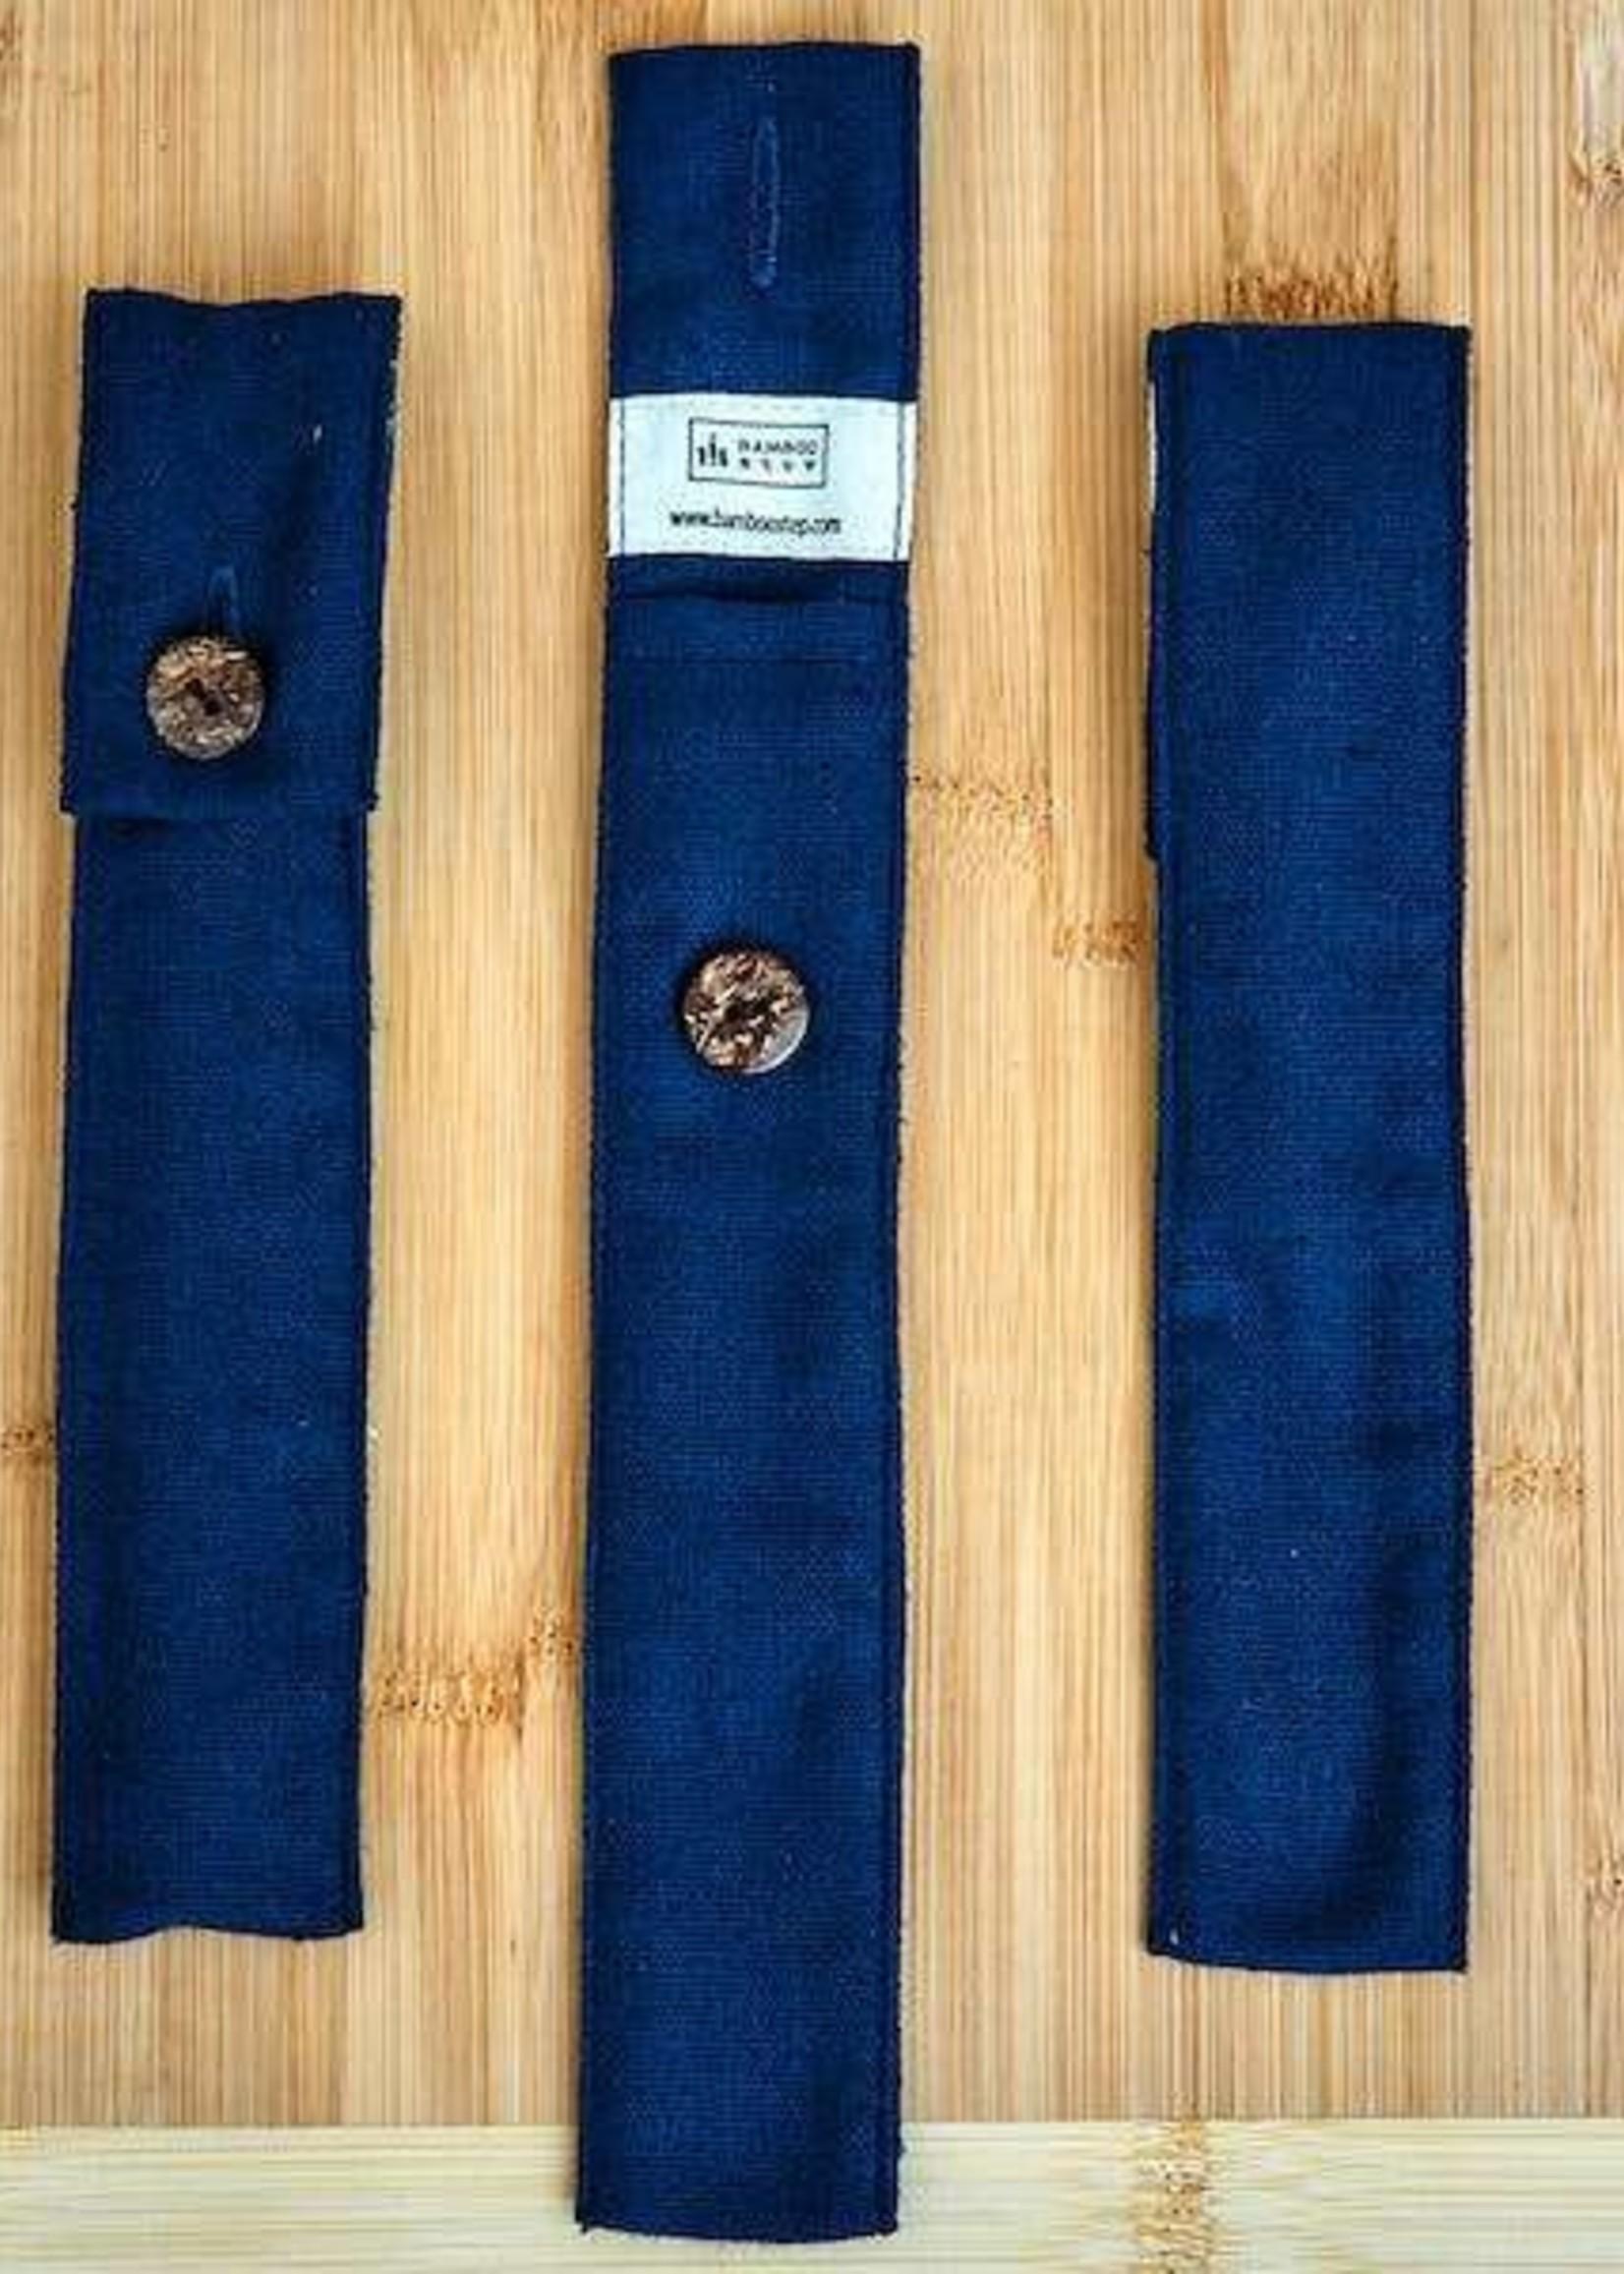 Bamboo Step Straw Travel Kit - Asst. Fabric Patterns